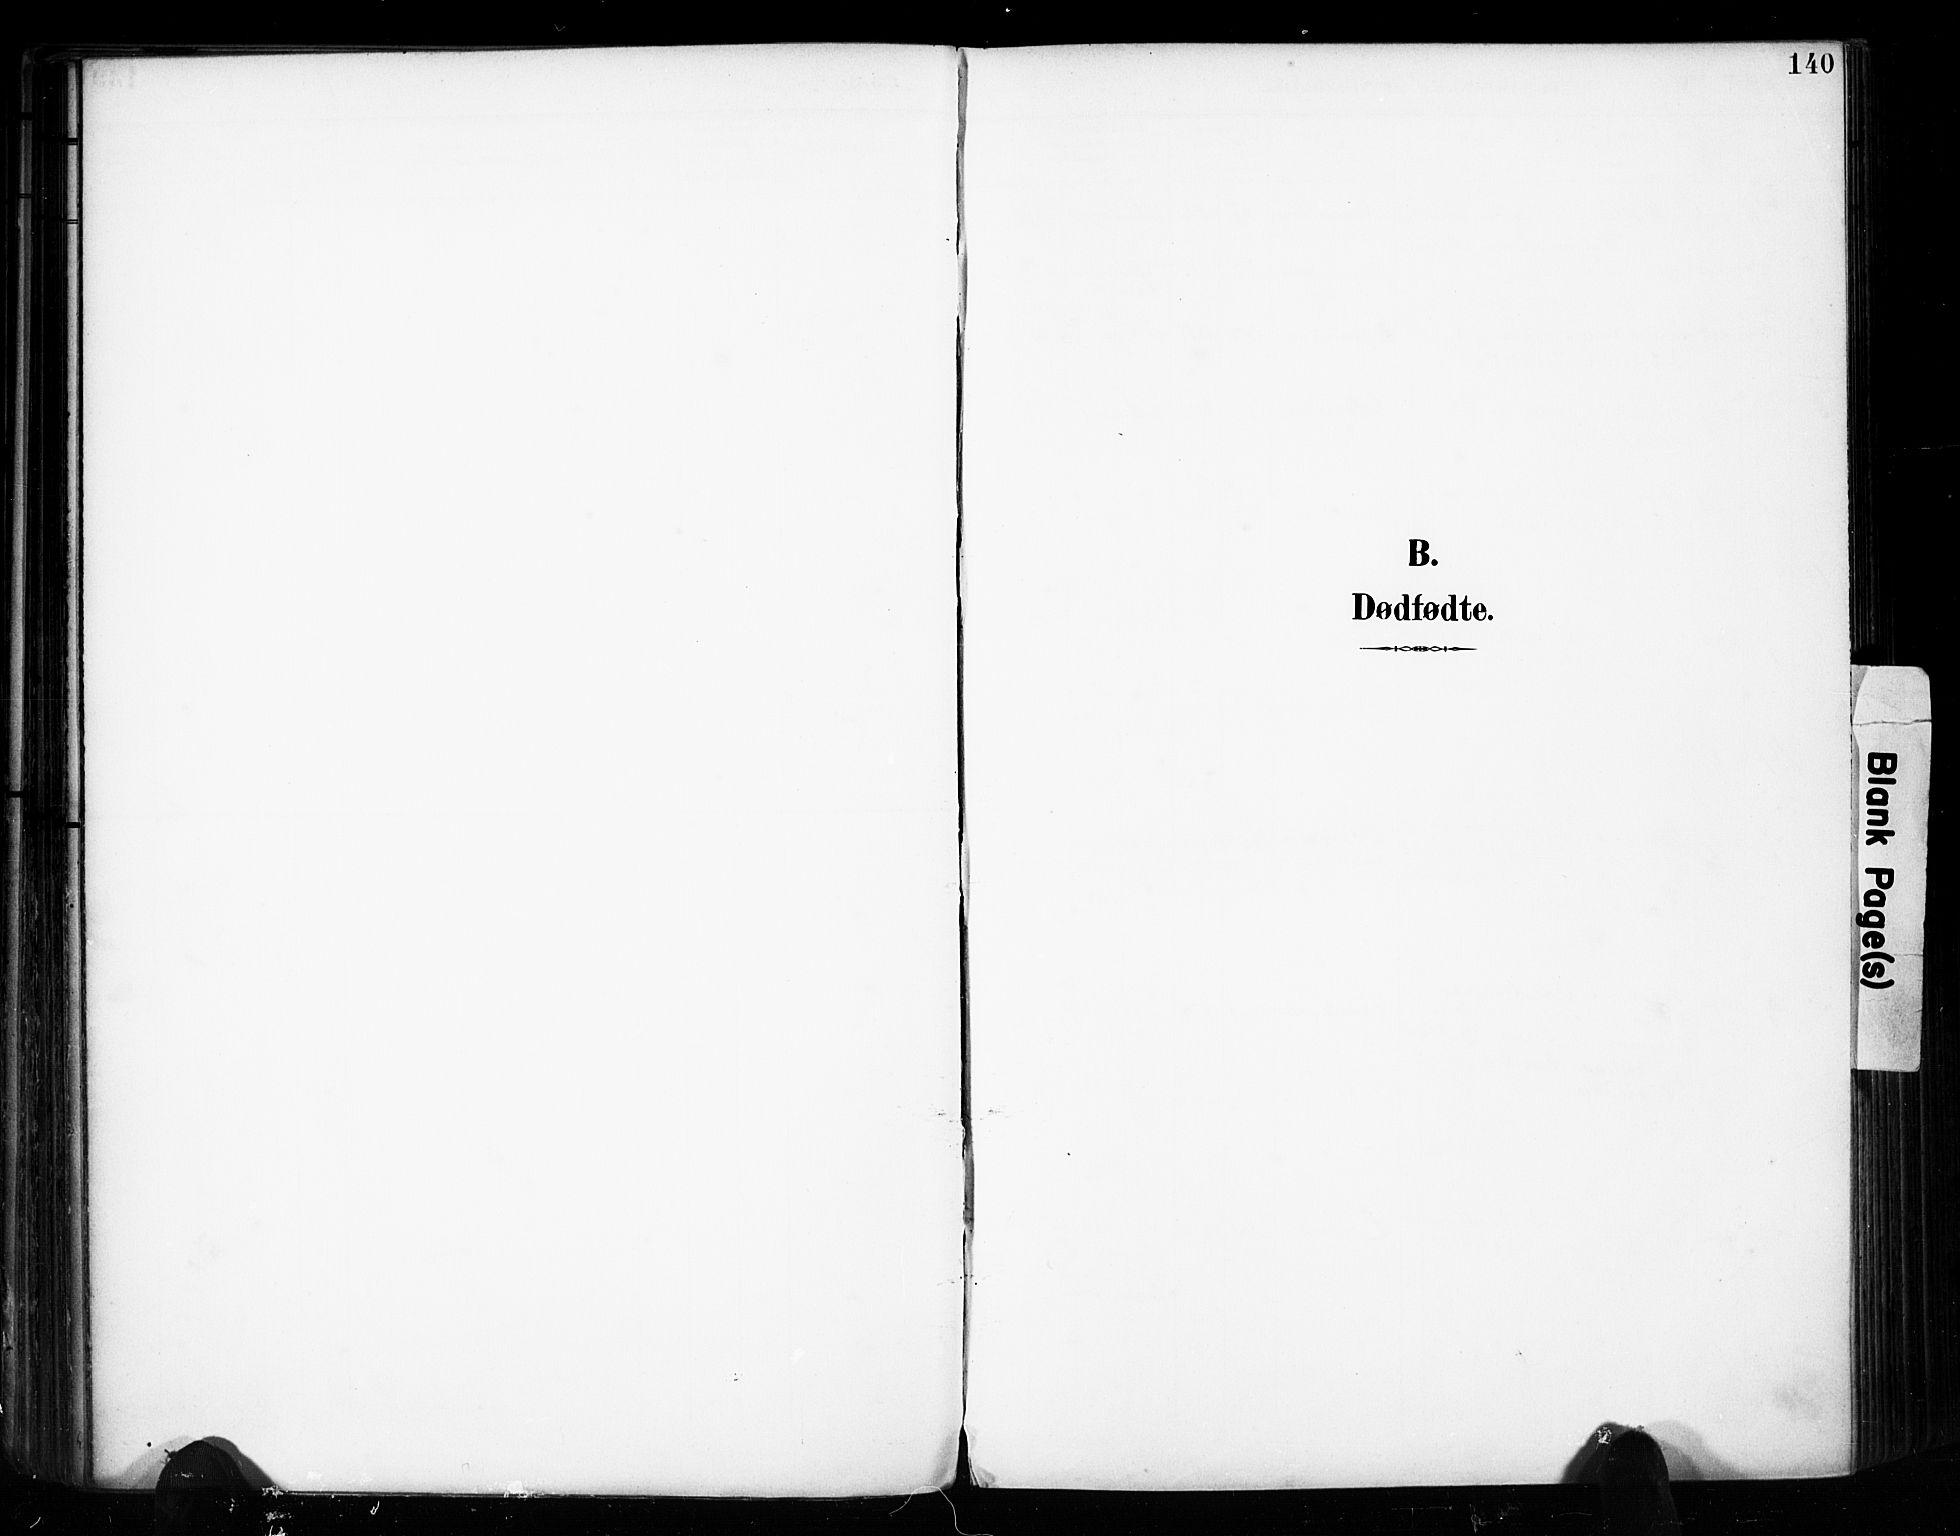 SAH, Vestre Toten prestekontor, H/Ha/Haa/L0011: Ministerialbok nr. 11, 1895-1906, s. 140